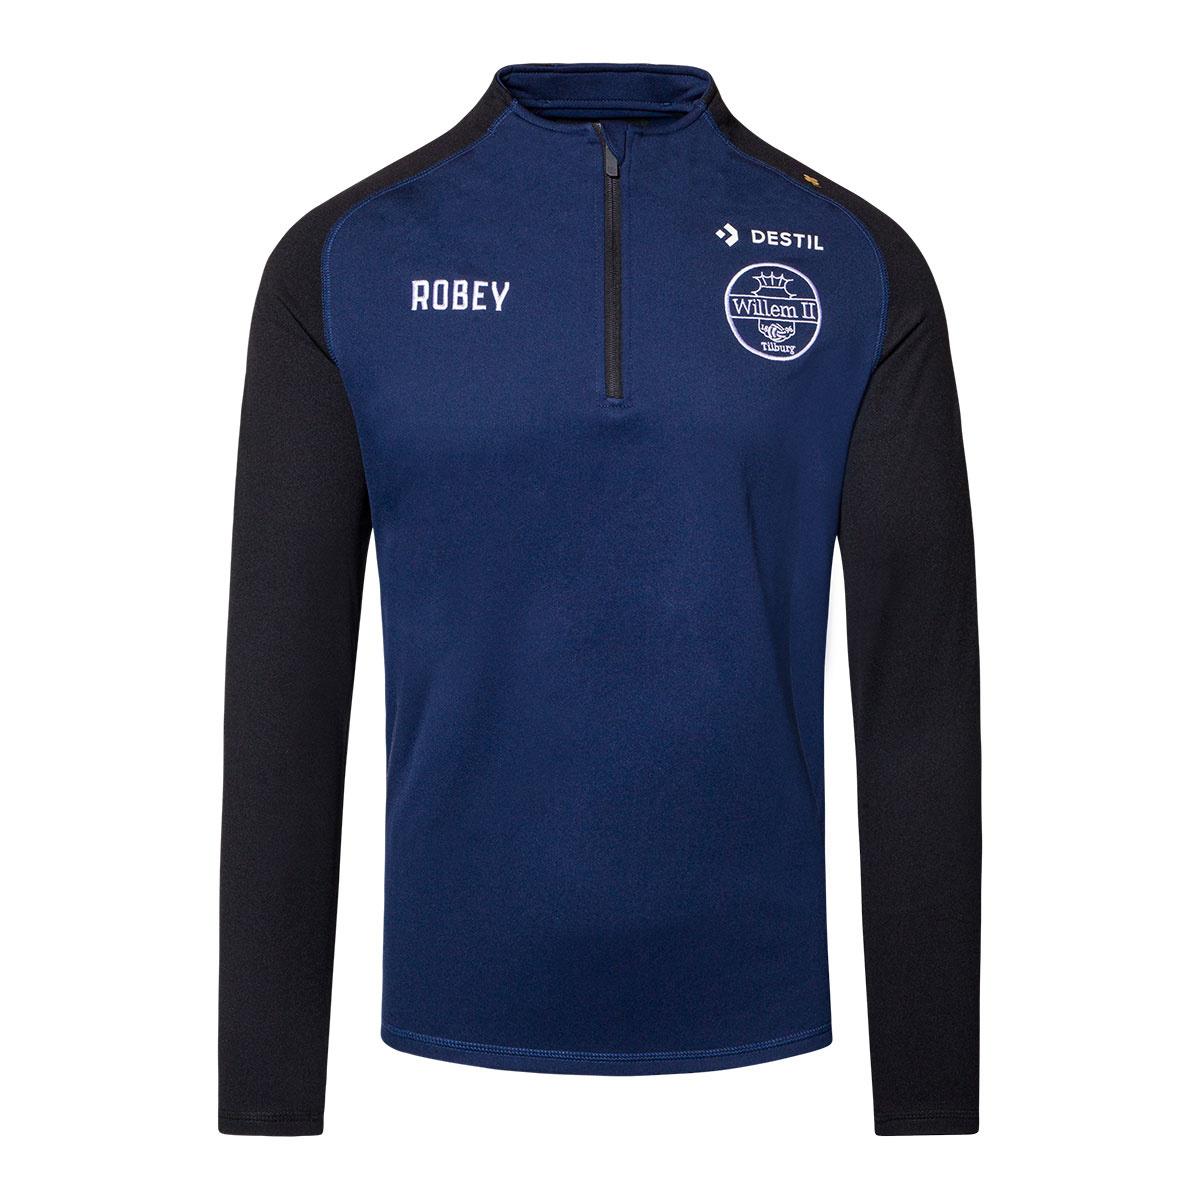 Robey Willem II warming-up top senior 2019-2020